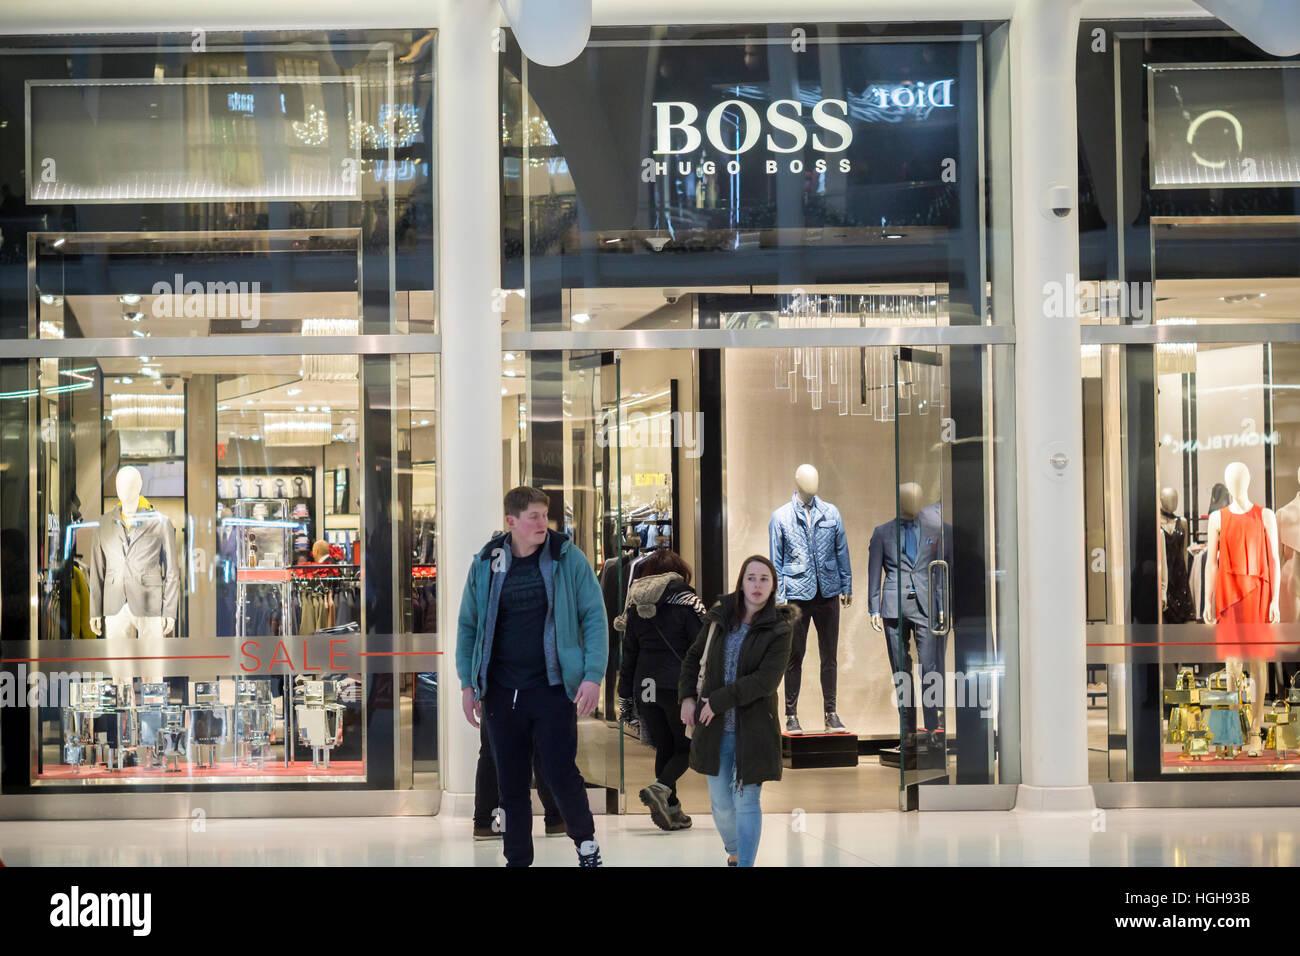 hugo boss store stock photos amp hugo boss store stock